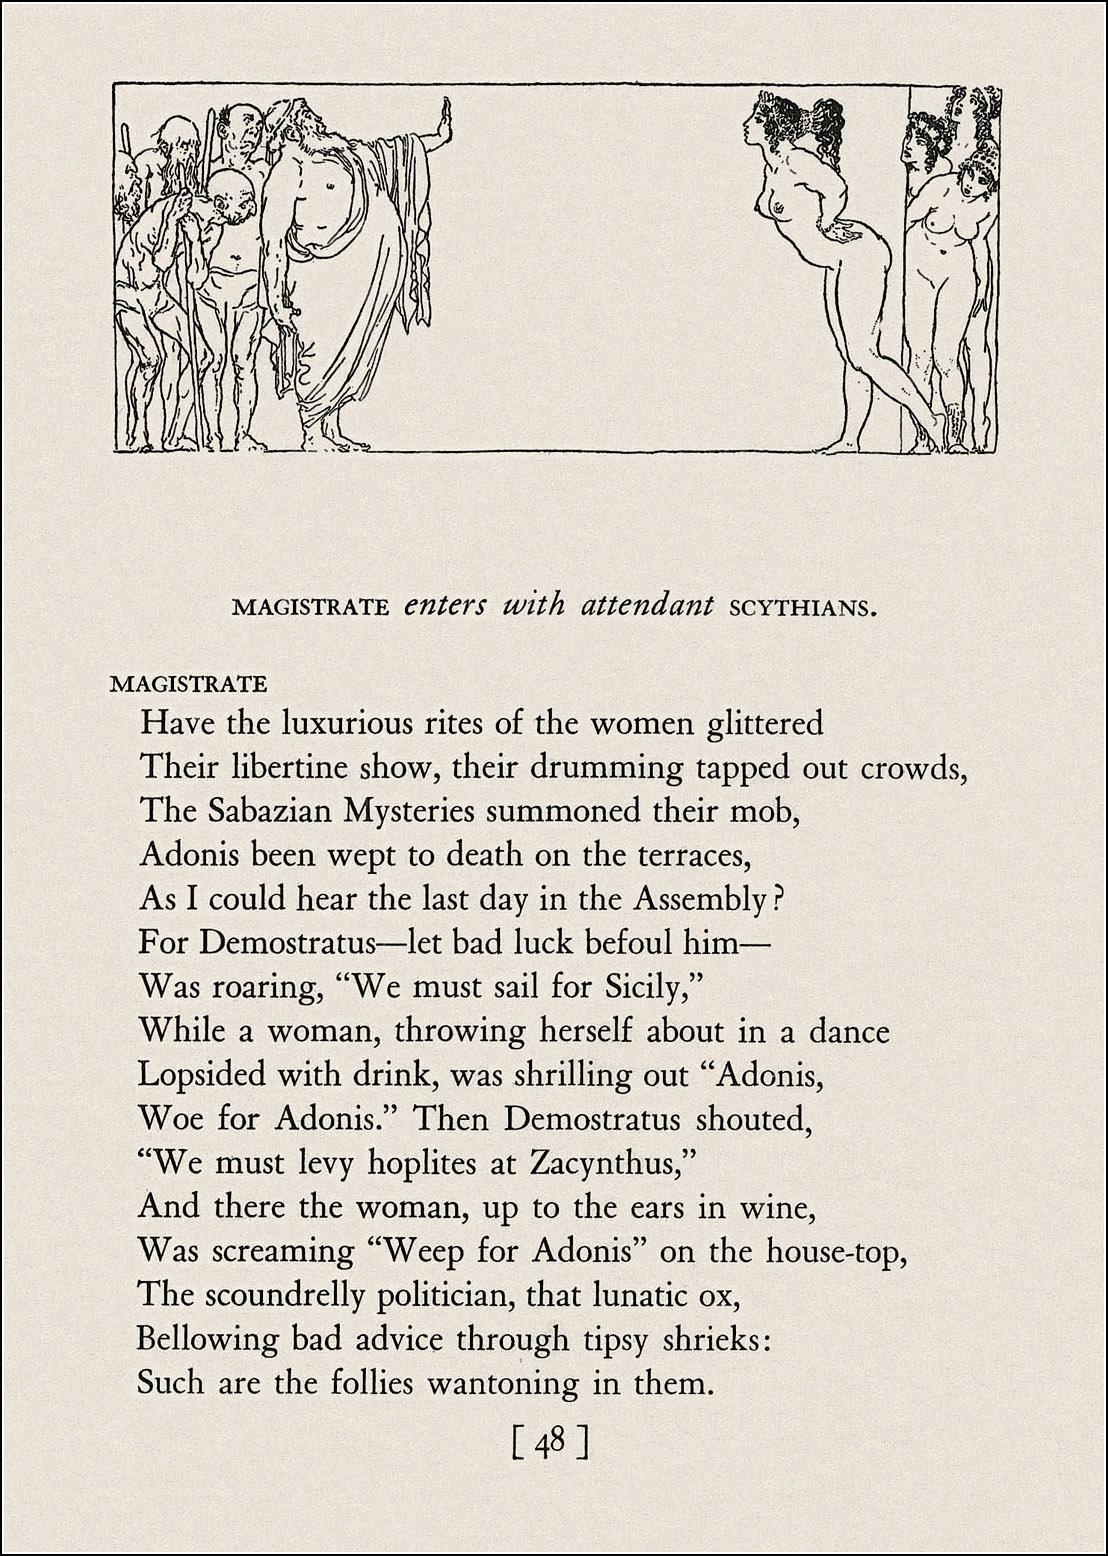 Norman Lindsay, Aristophanes, Lysistrata